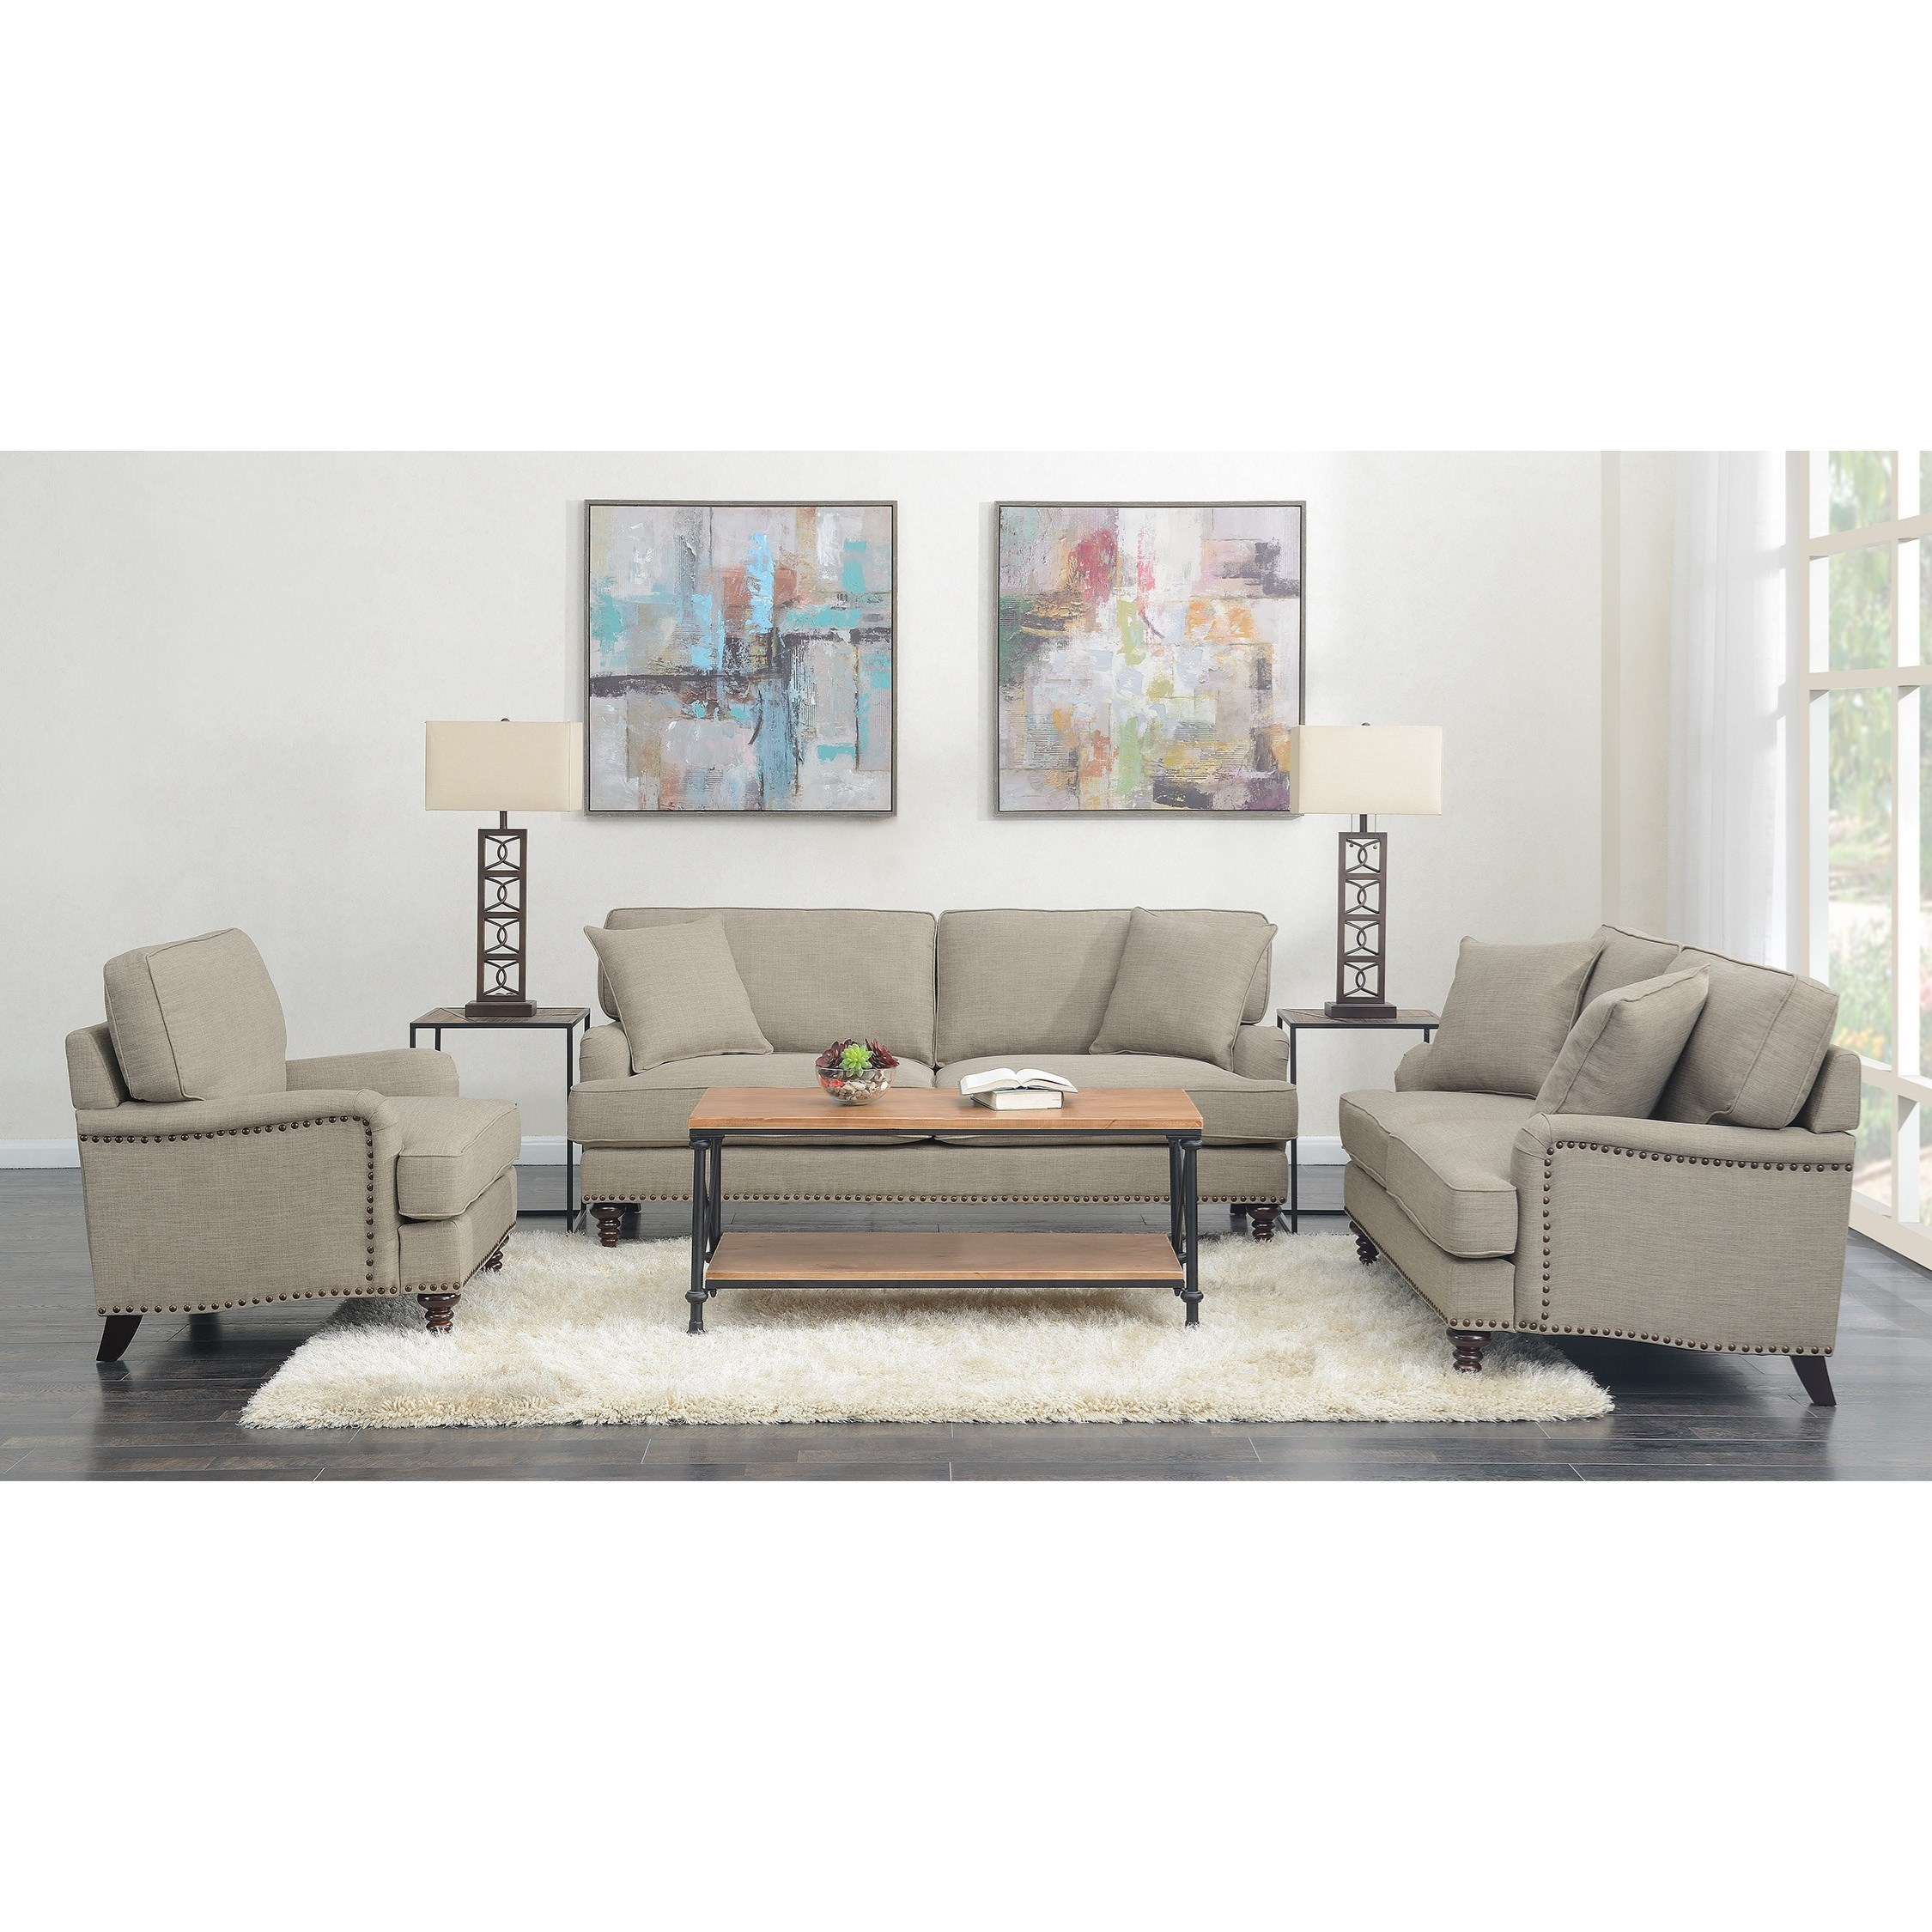 Abby 3PC Set-Sofa, Loveseat & Chair by Elements International at Goffena Furniture & Mattress Center